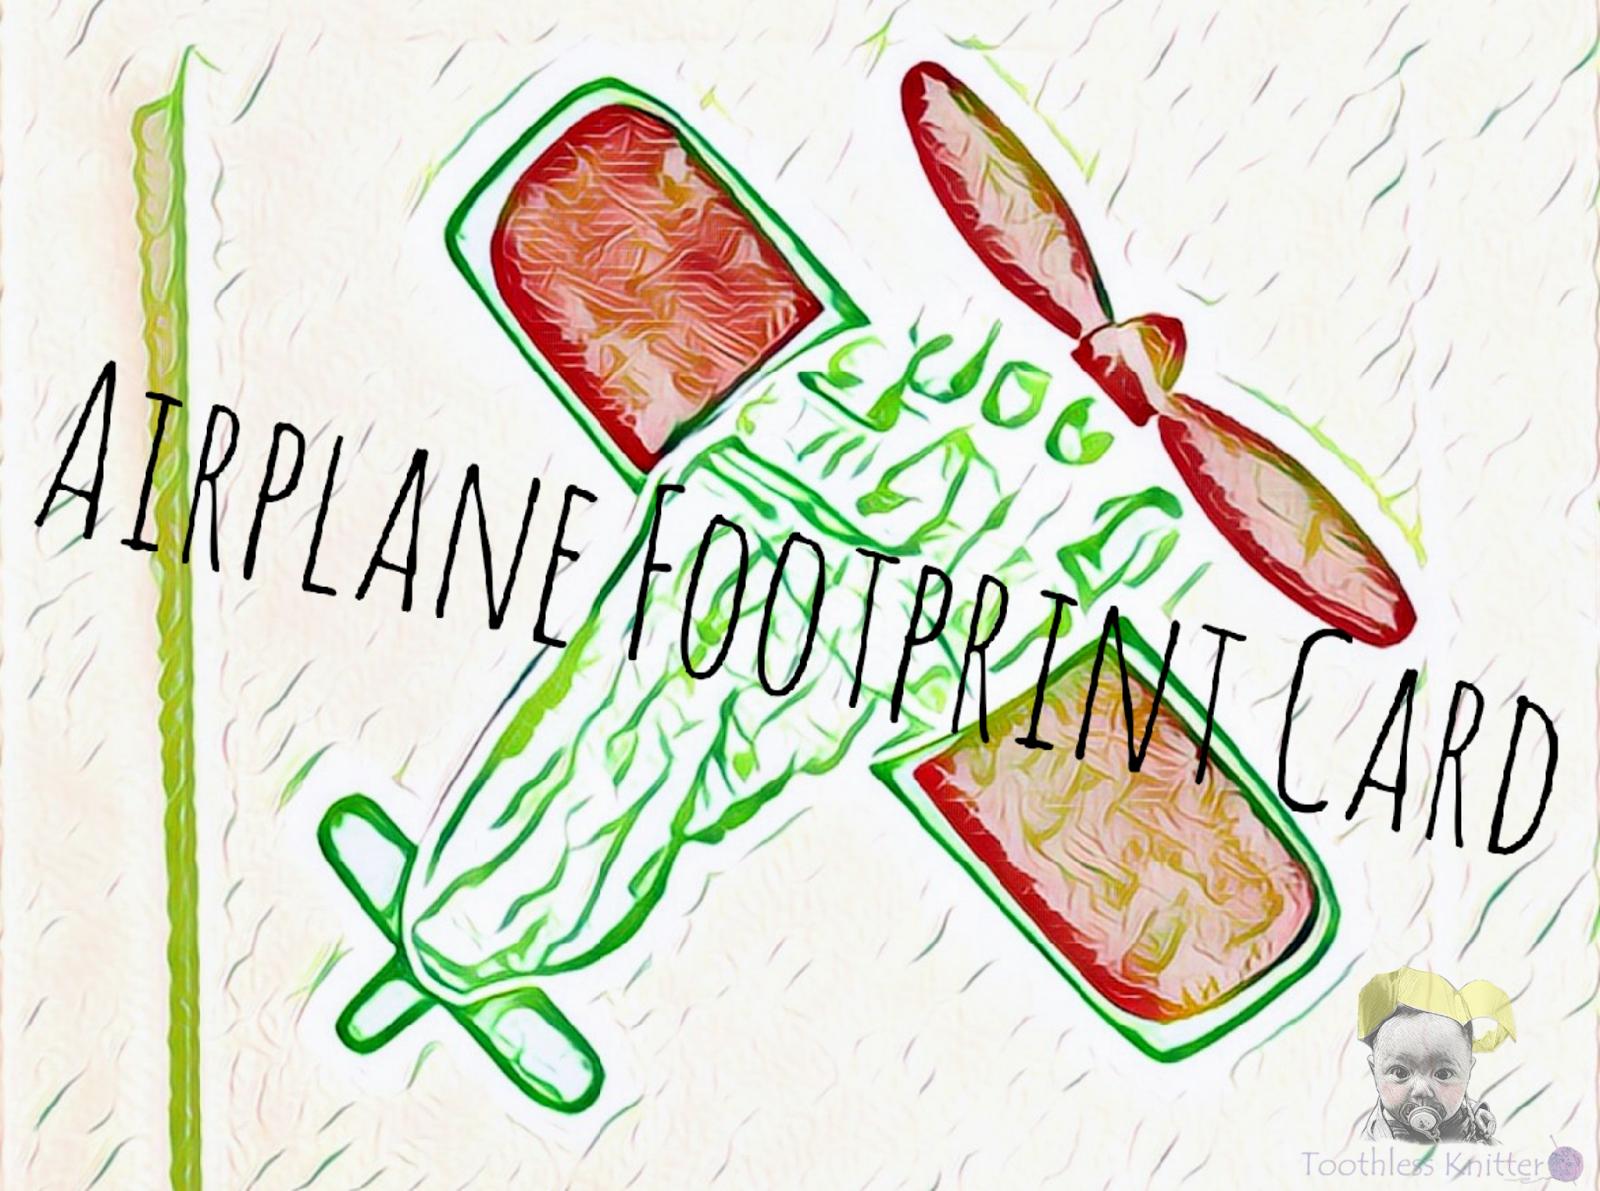 Airplane Footprint Card / Kartka z Odciskiem Stópki - Samolot